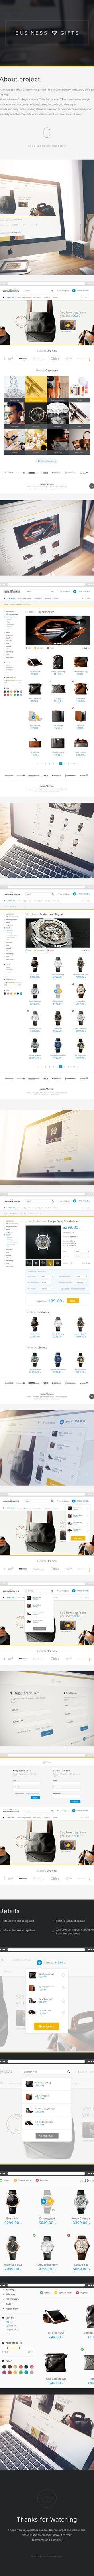 E-Site Business Gifts Web Design by Simon Aleksander, via Behance